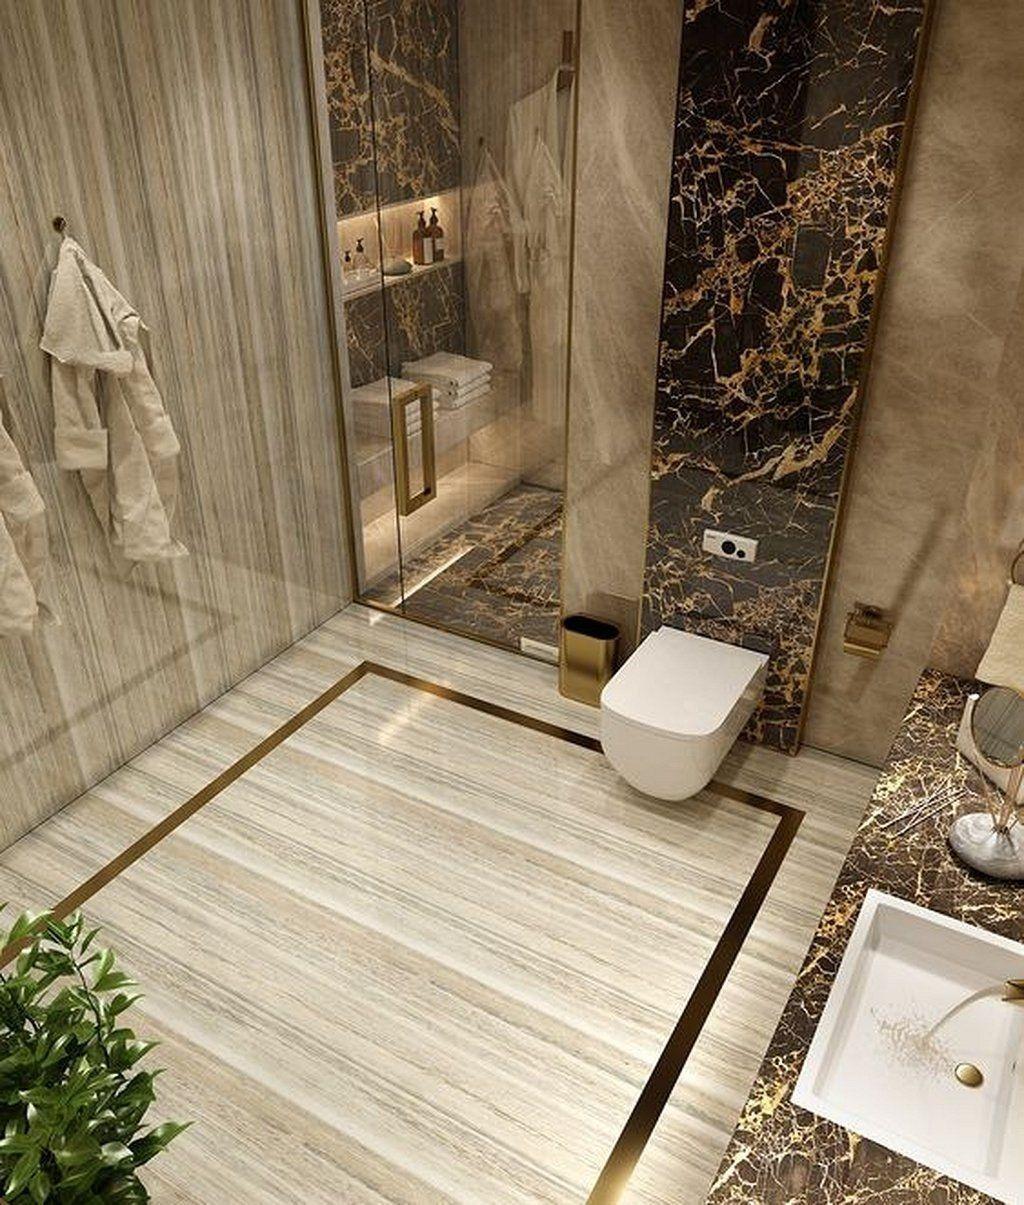 Bathroom Ideas Master ديكور حمامات نفض ترميم 0096171170181 ديكور حمام ماستر نفض ترميم عالعضم Bathroom Inspiration Modern Bathroom Remodel Cost Luxury Bathroom